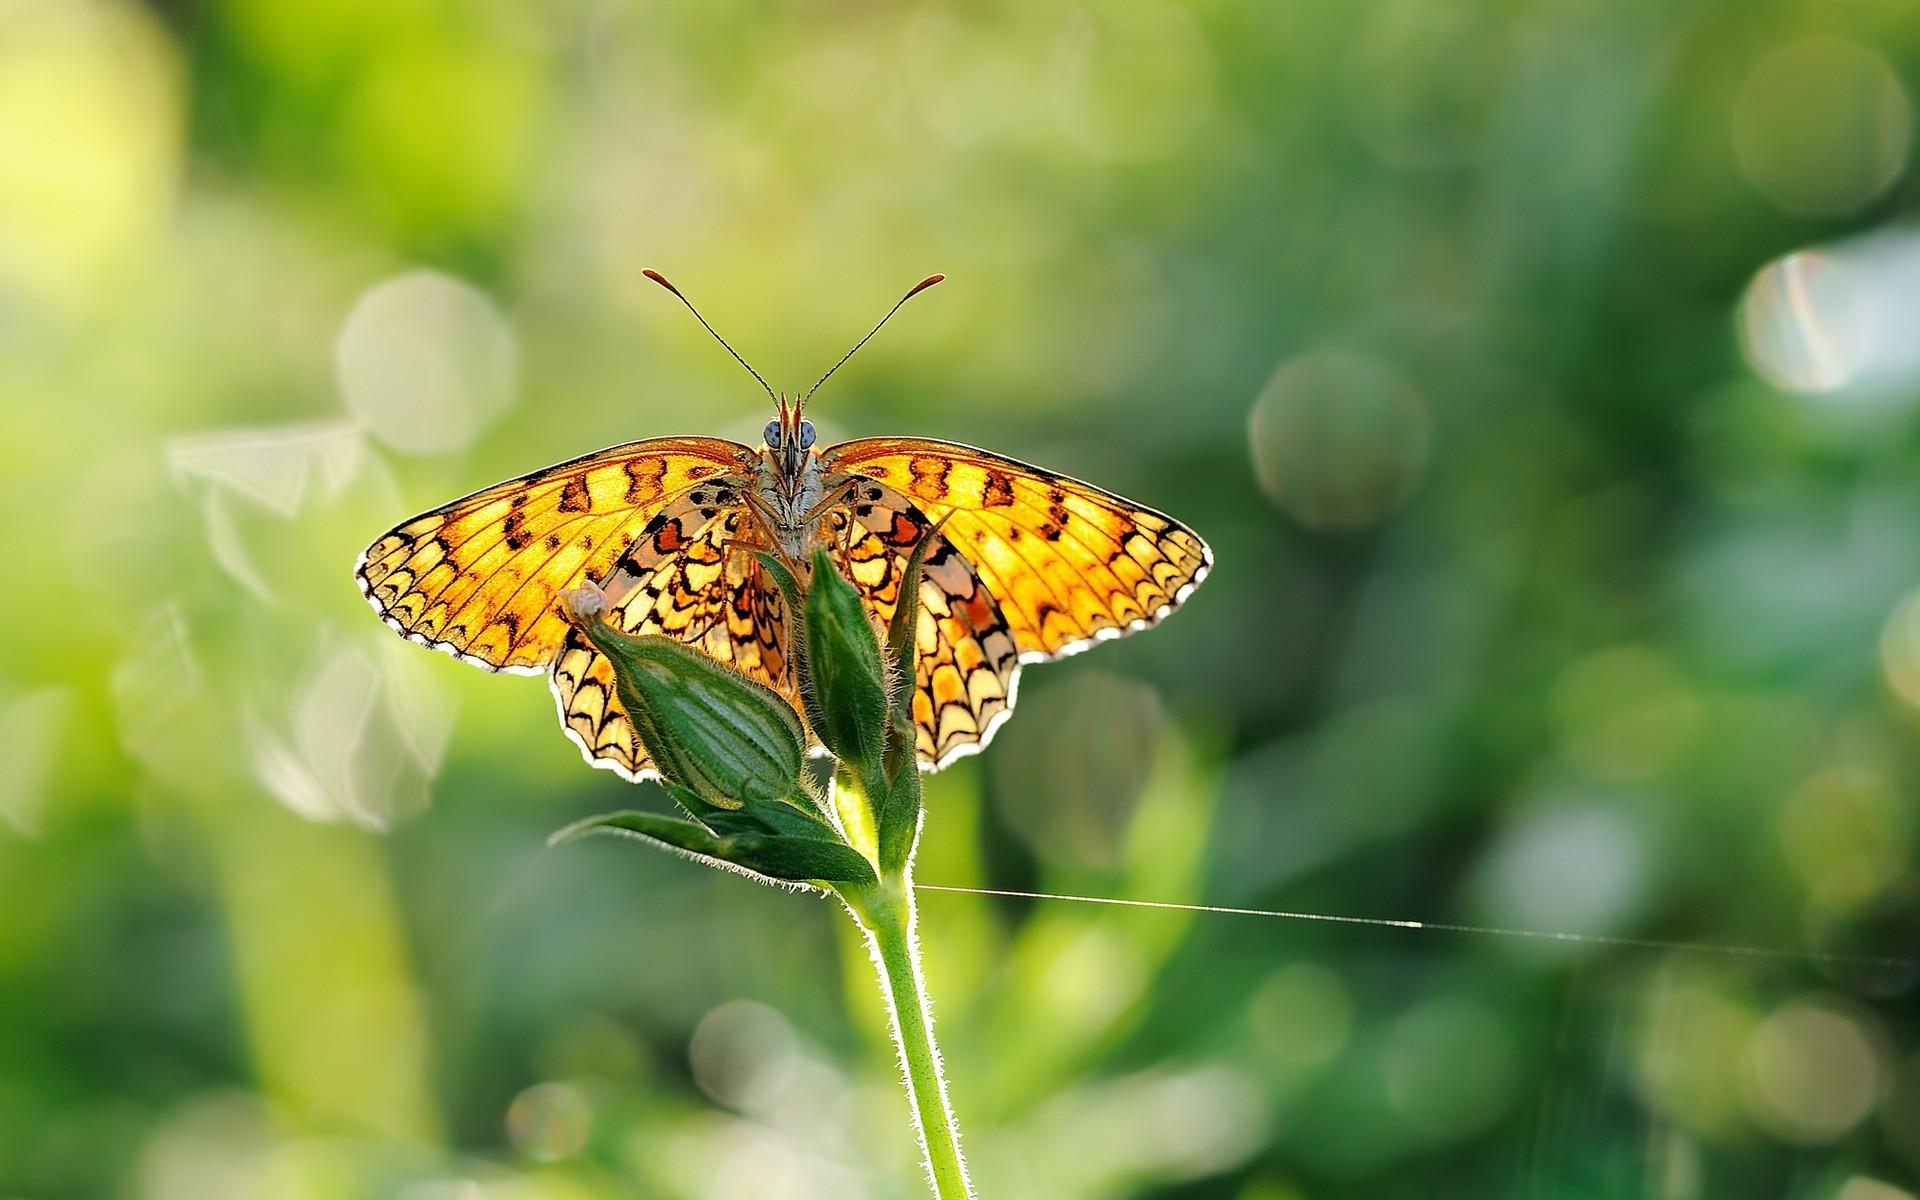 Bella mariposa en HDR - 1920x1200